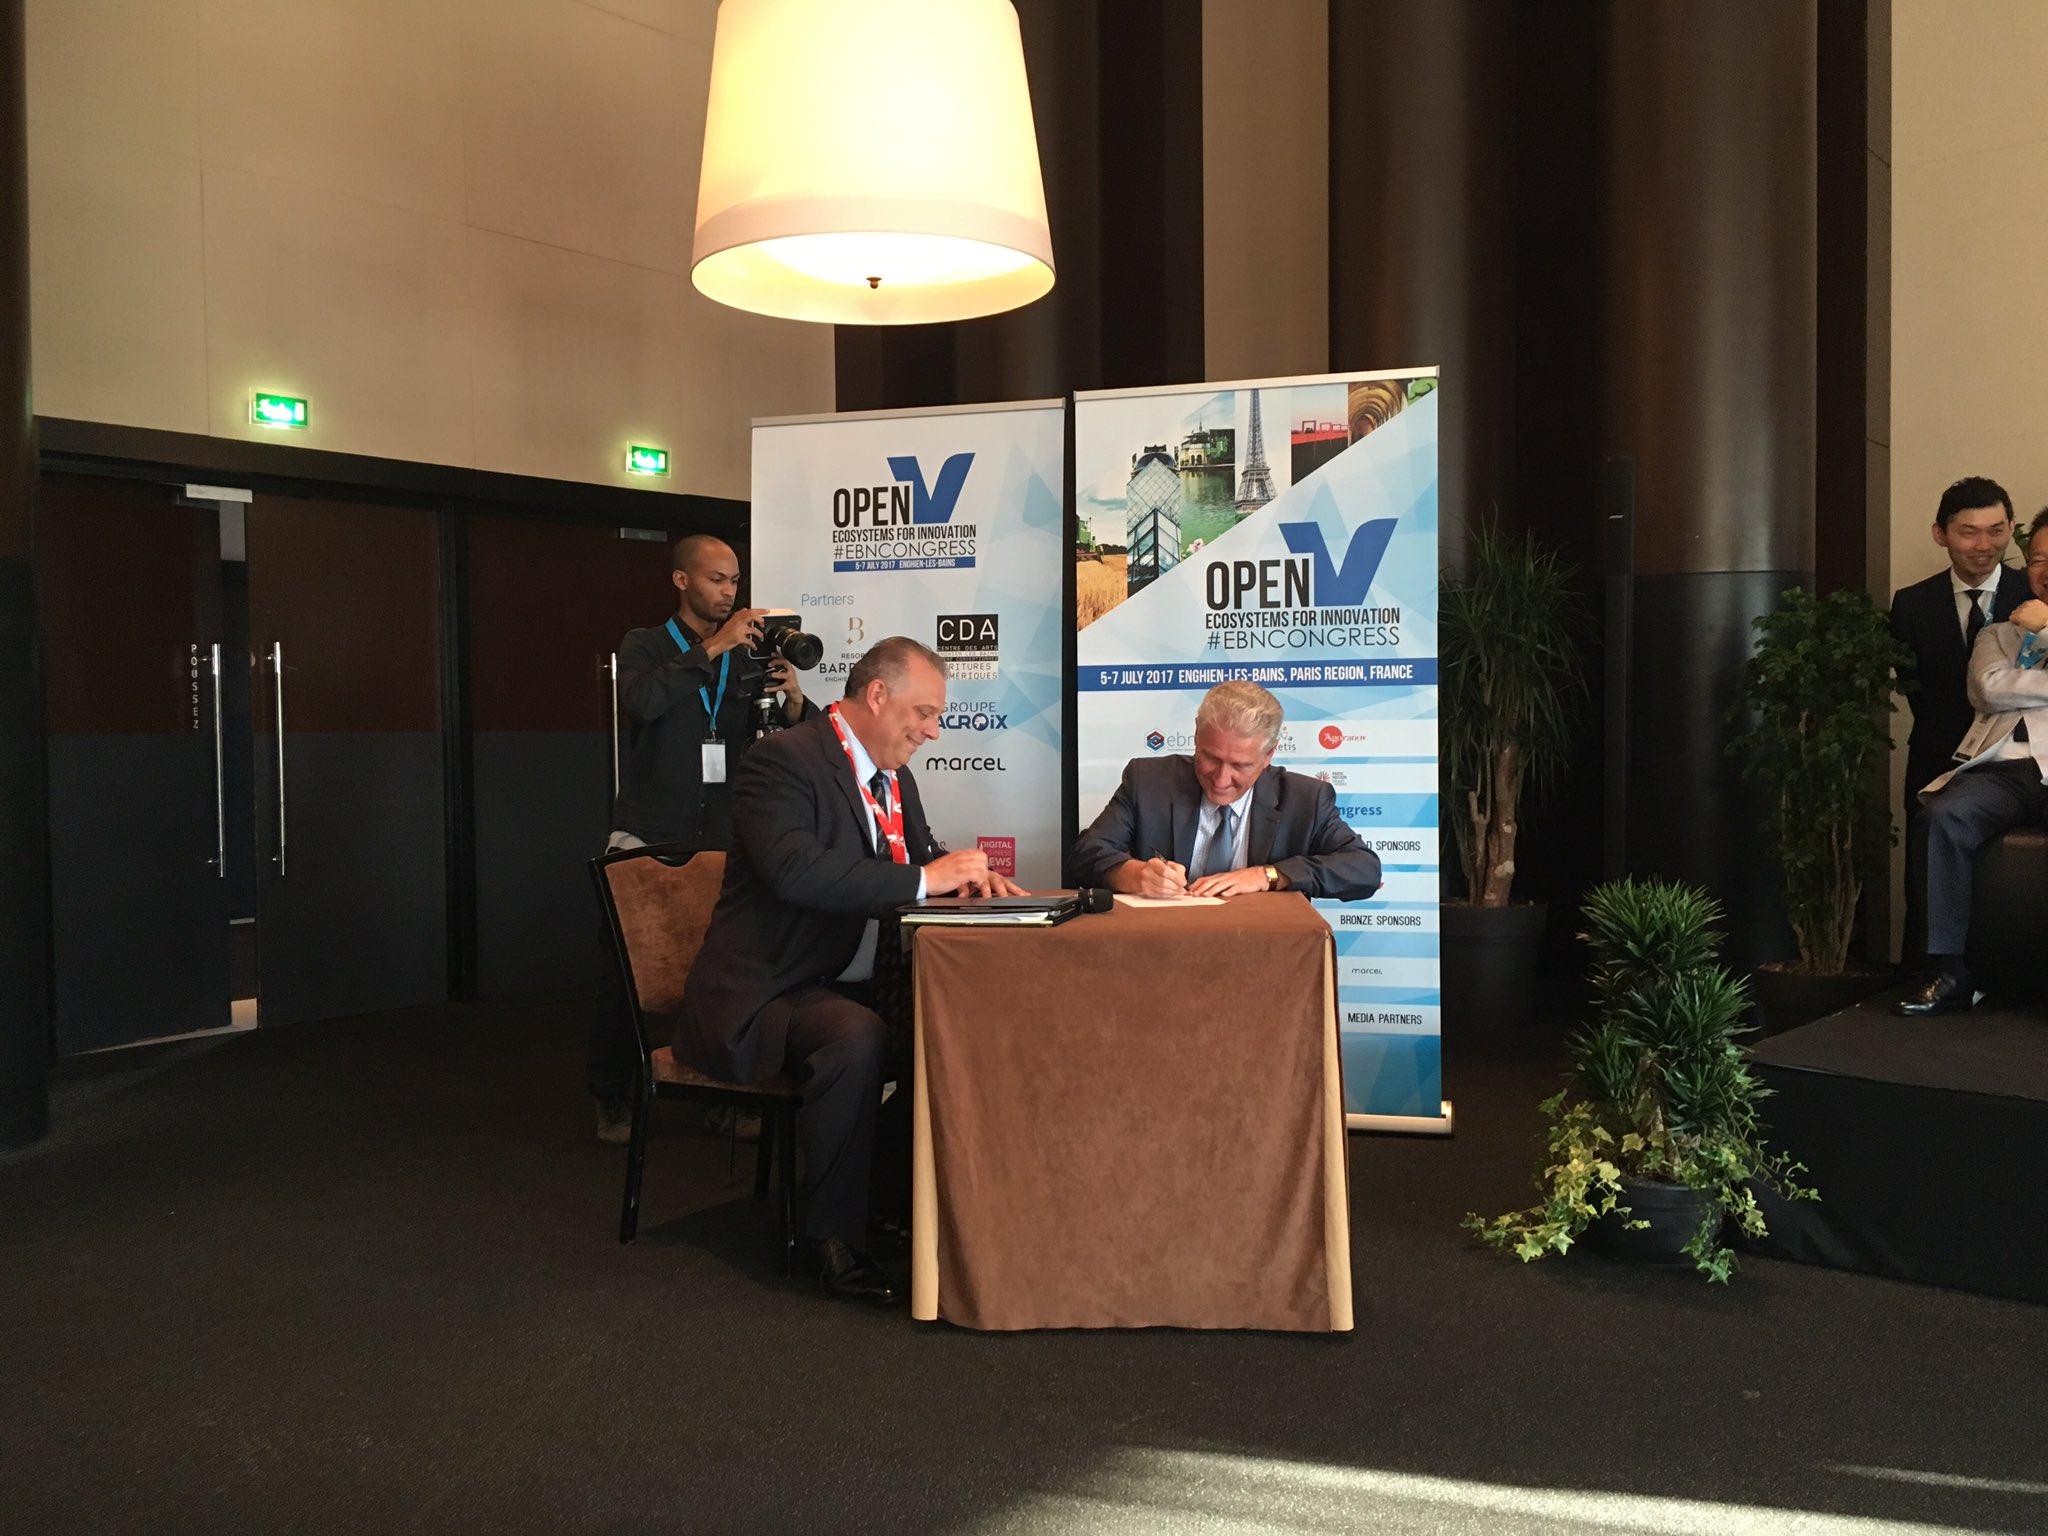 Focus on Retis & @CollierEDO partnership at Retis #EBNCONGRESS. Jace Kentner signing a new agreement between @ACCET_VOT and @NaplesAcceler8 https://t.co/QY0igWwBGr